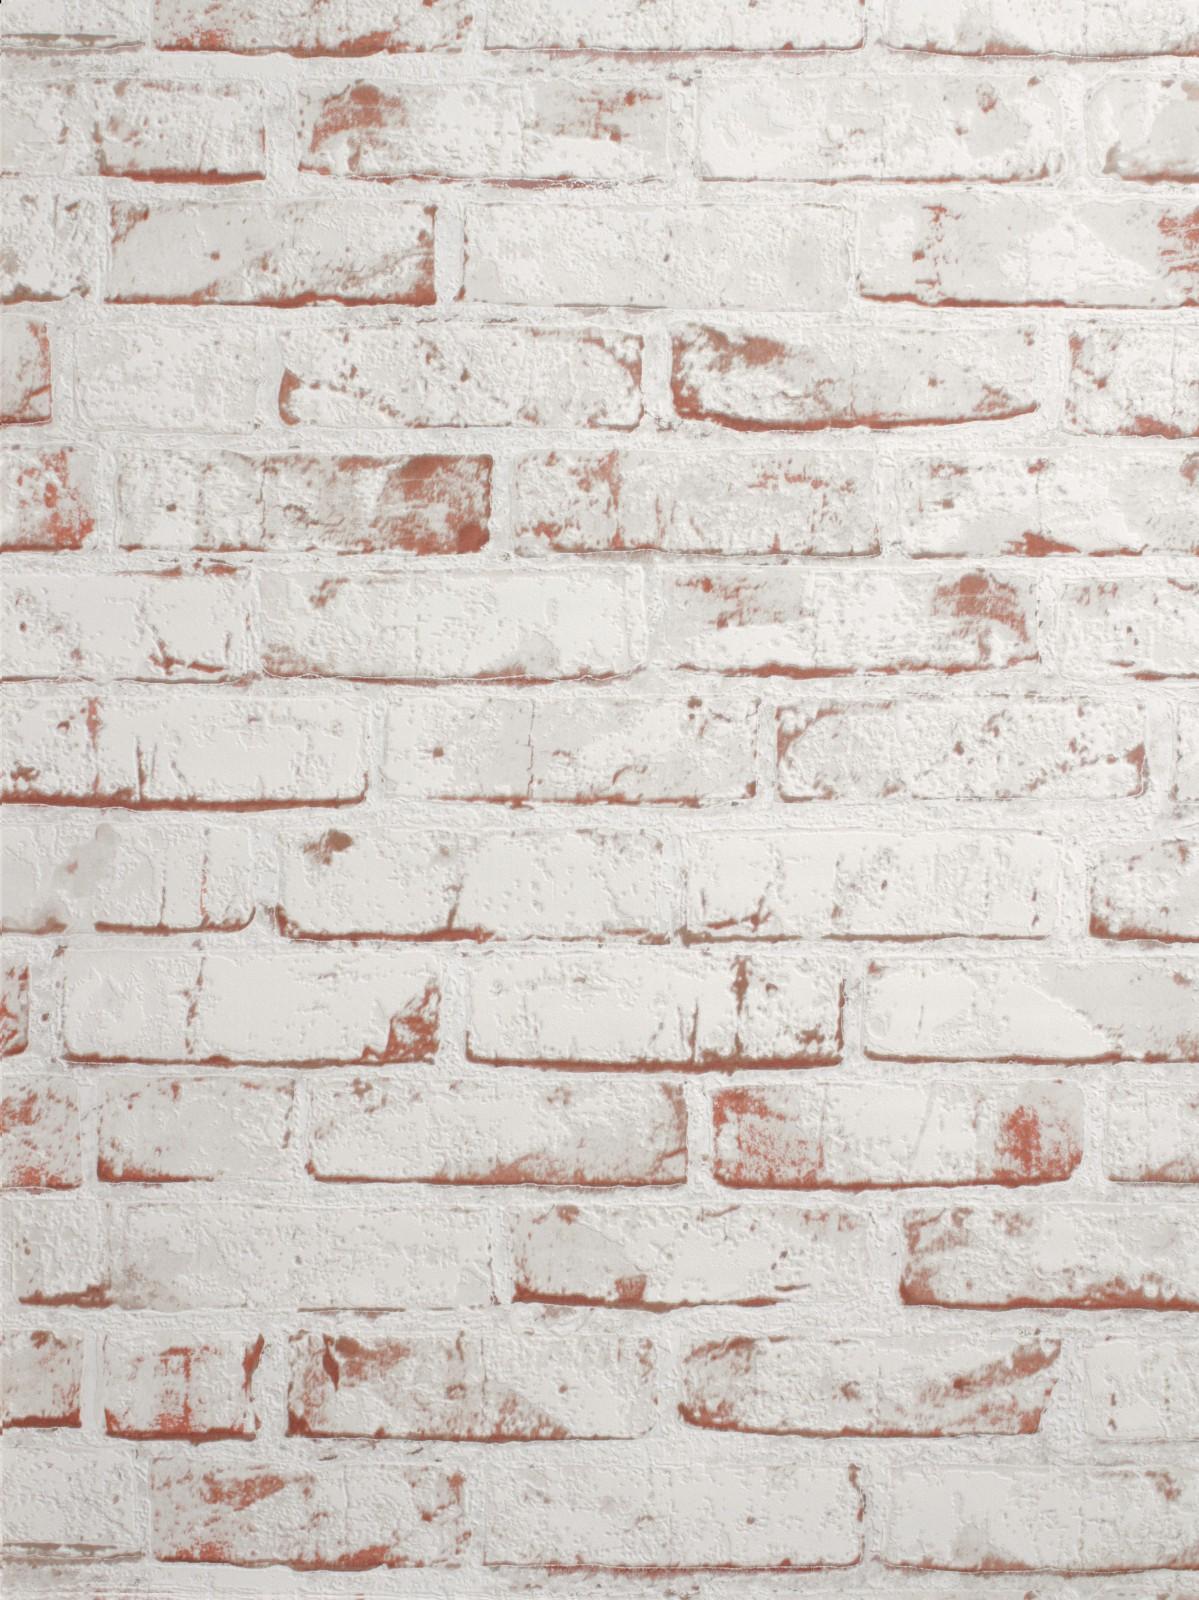 tapete vlies steine wei as creation 9078 13. Black Bedroom Furniture Sets. Home Design Ideas